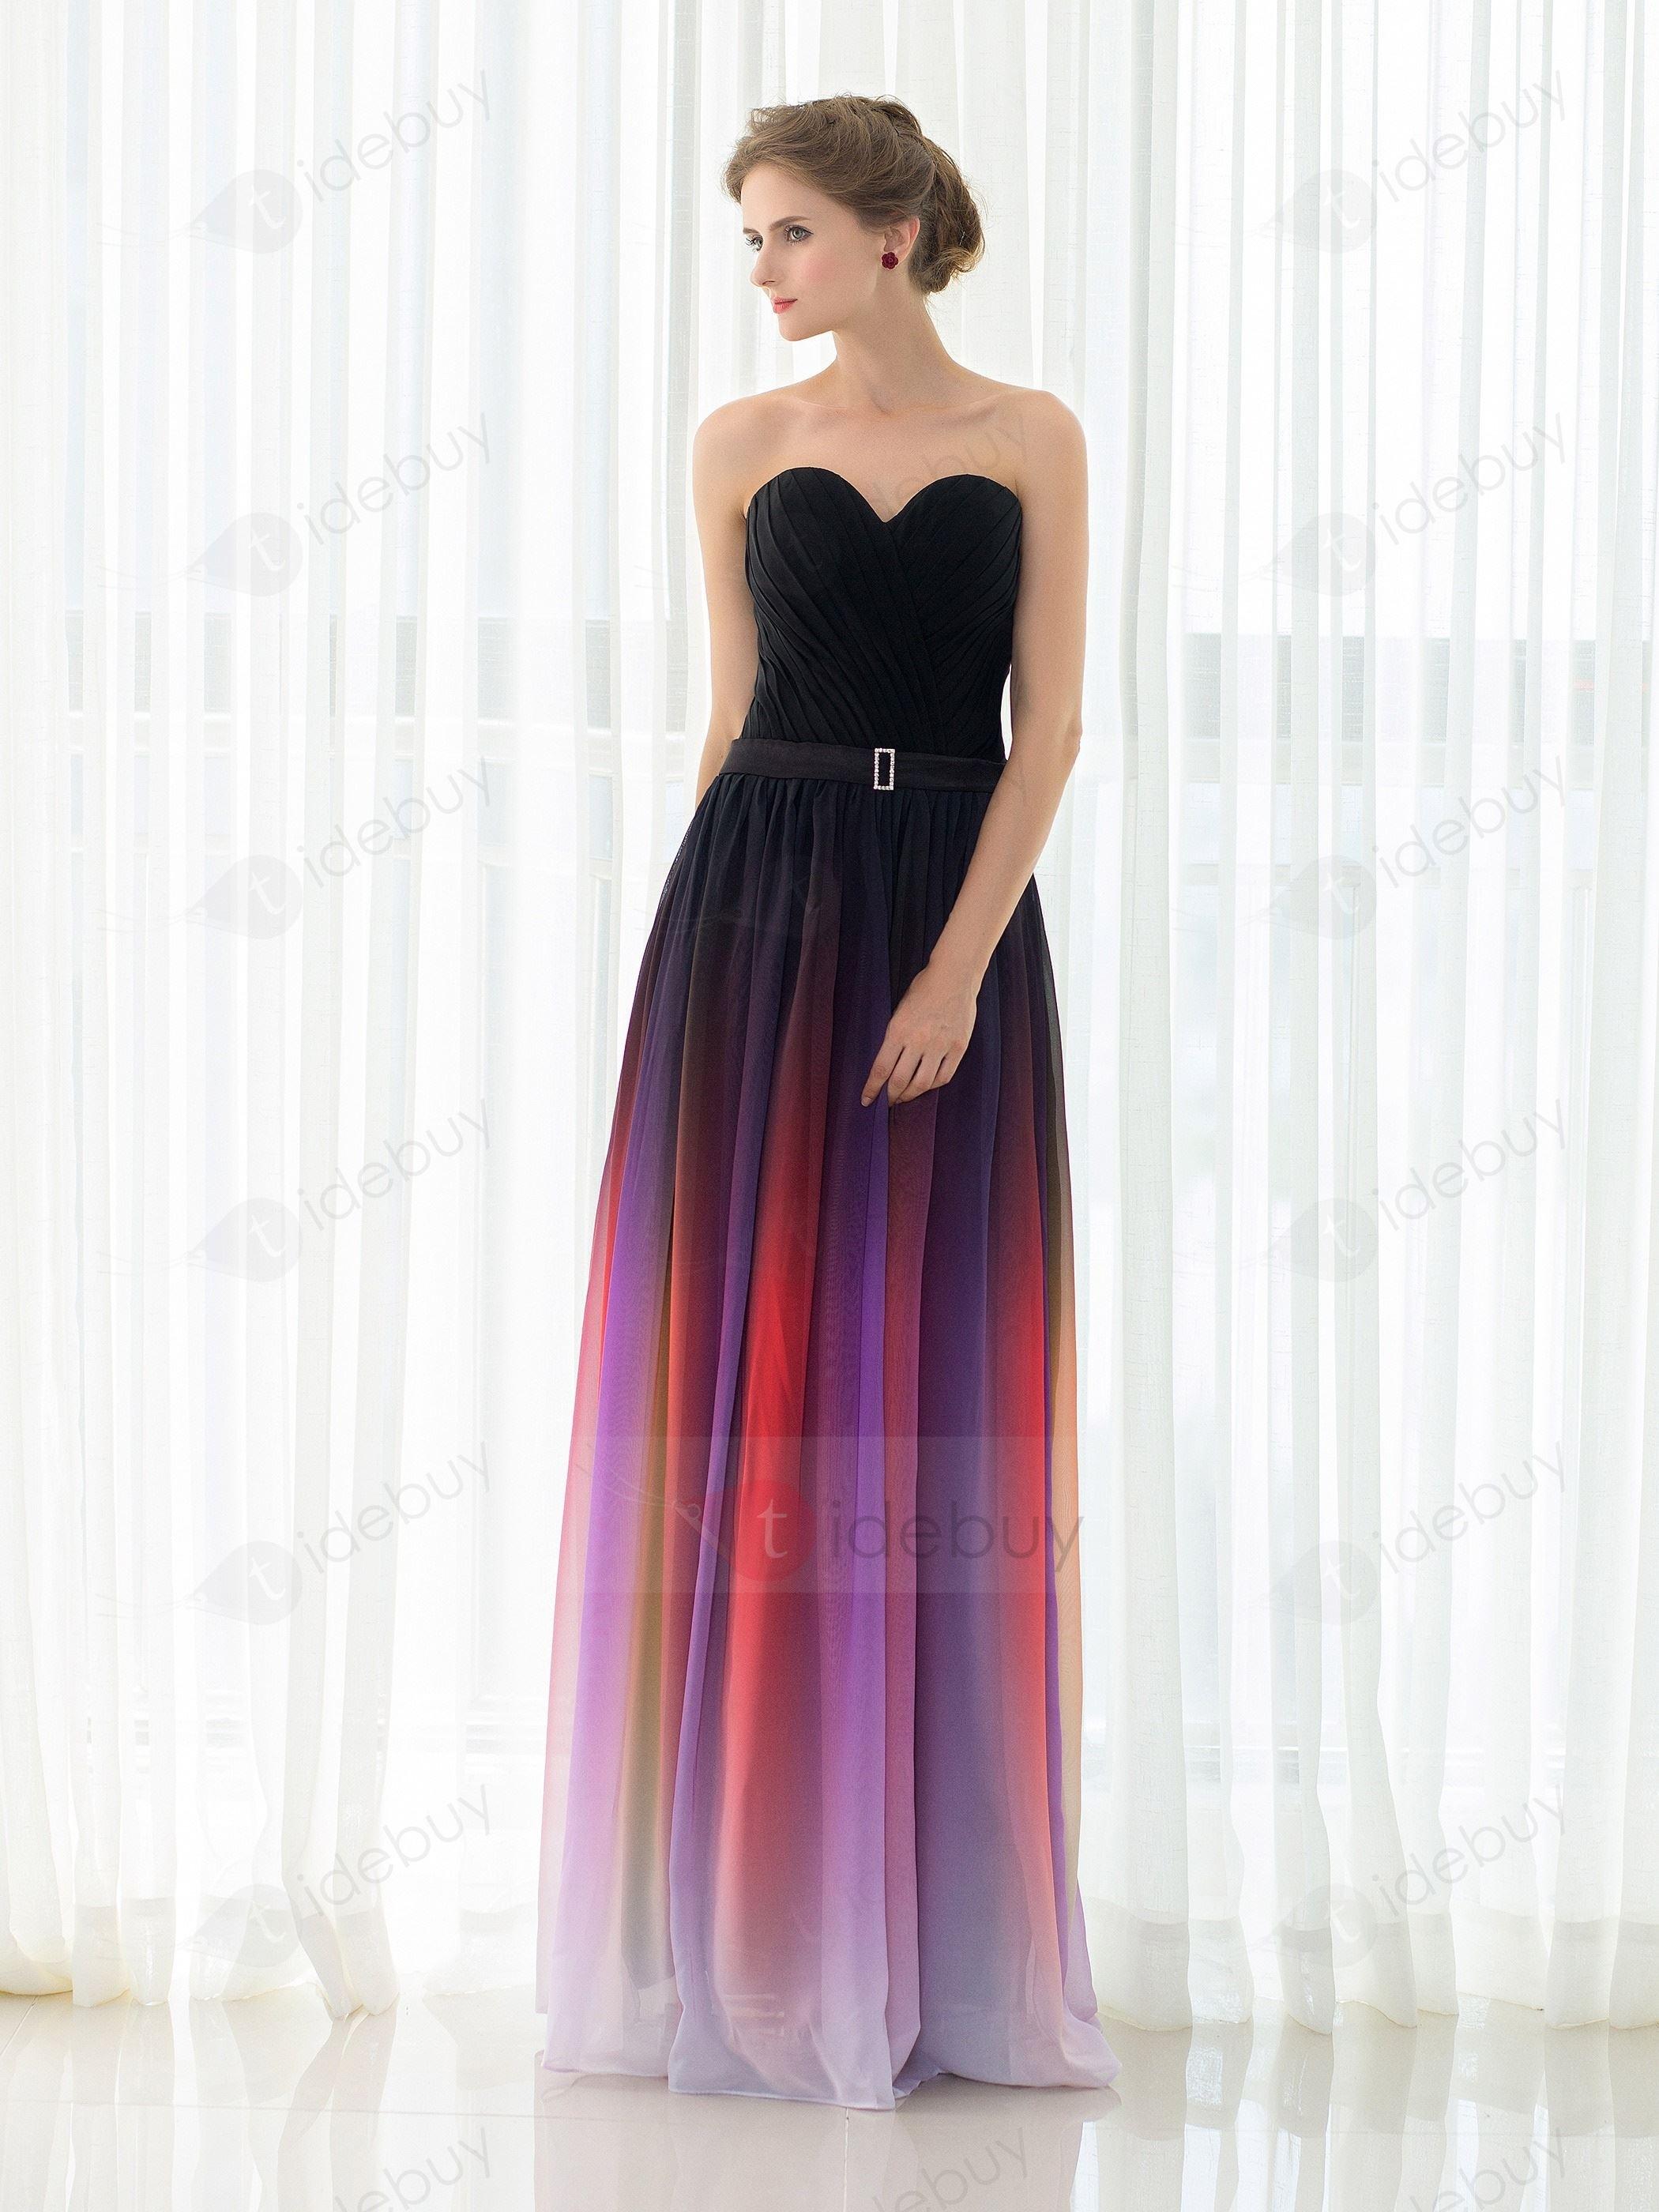 10 Spektakulär Ballkleid Abendkleid Lang Vertrieb20 Luxurius Ballkleid Abendkleid Lang Bester Preis